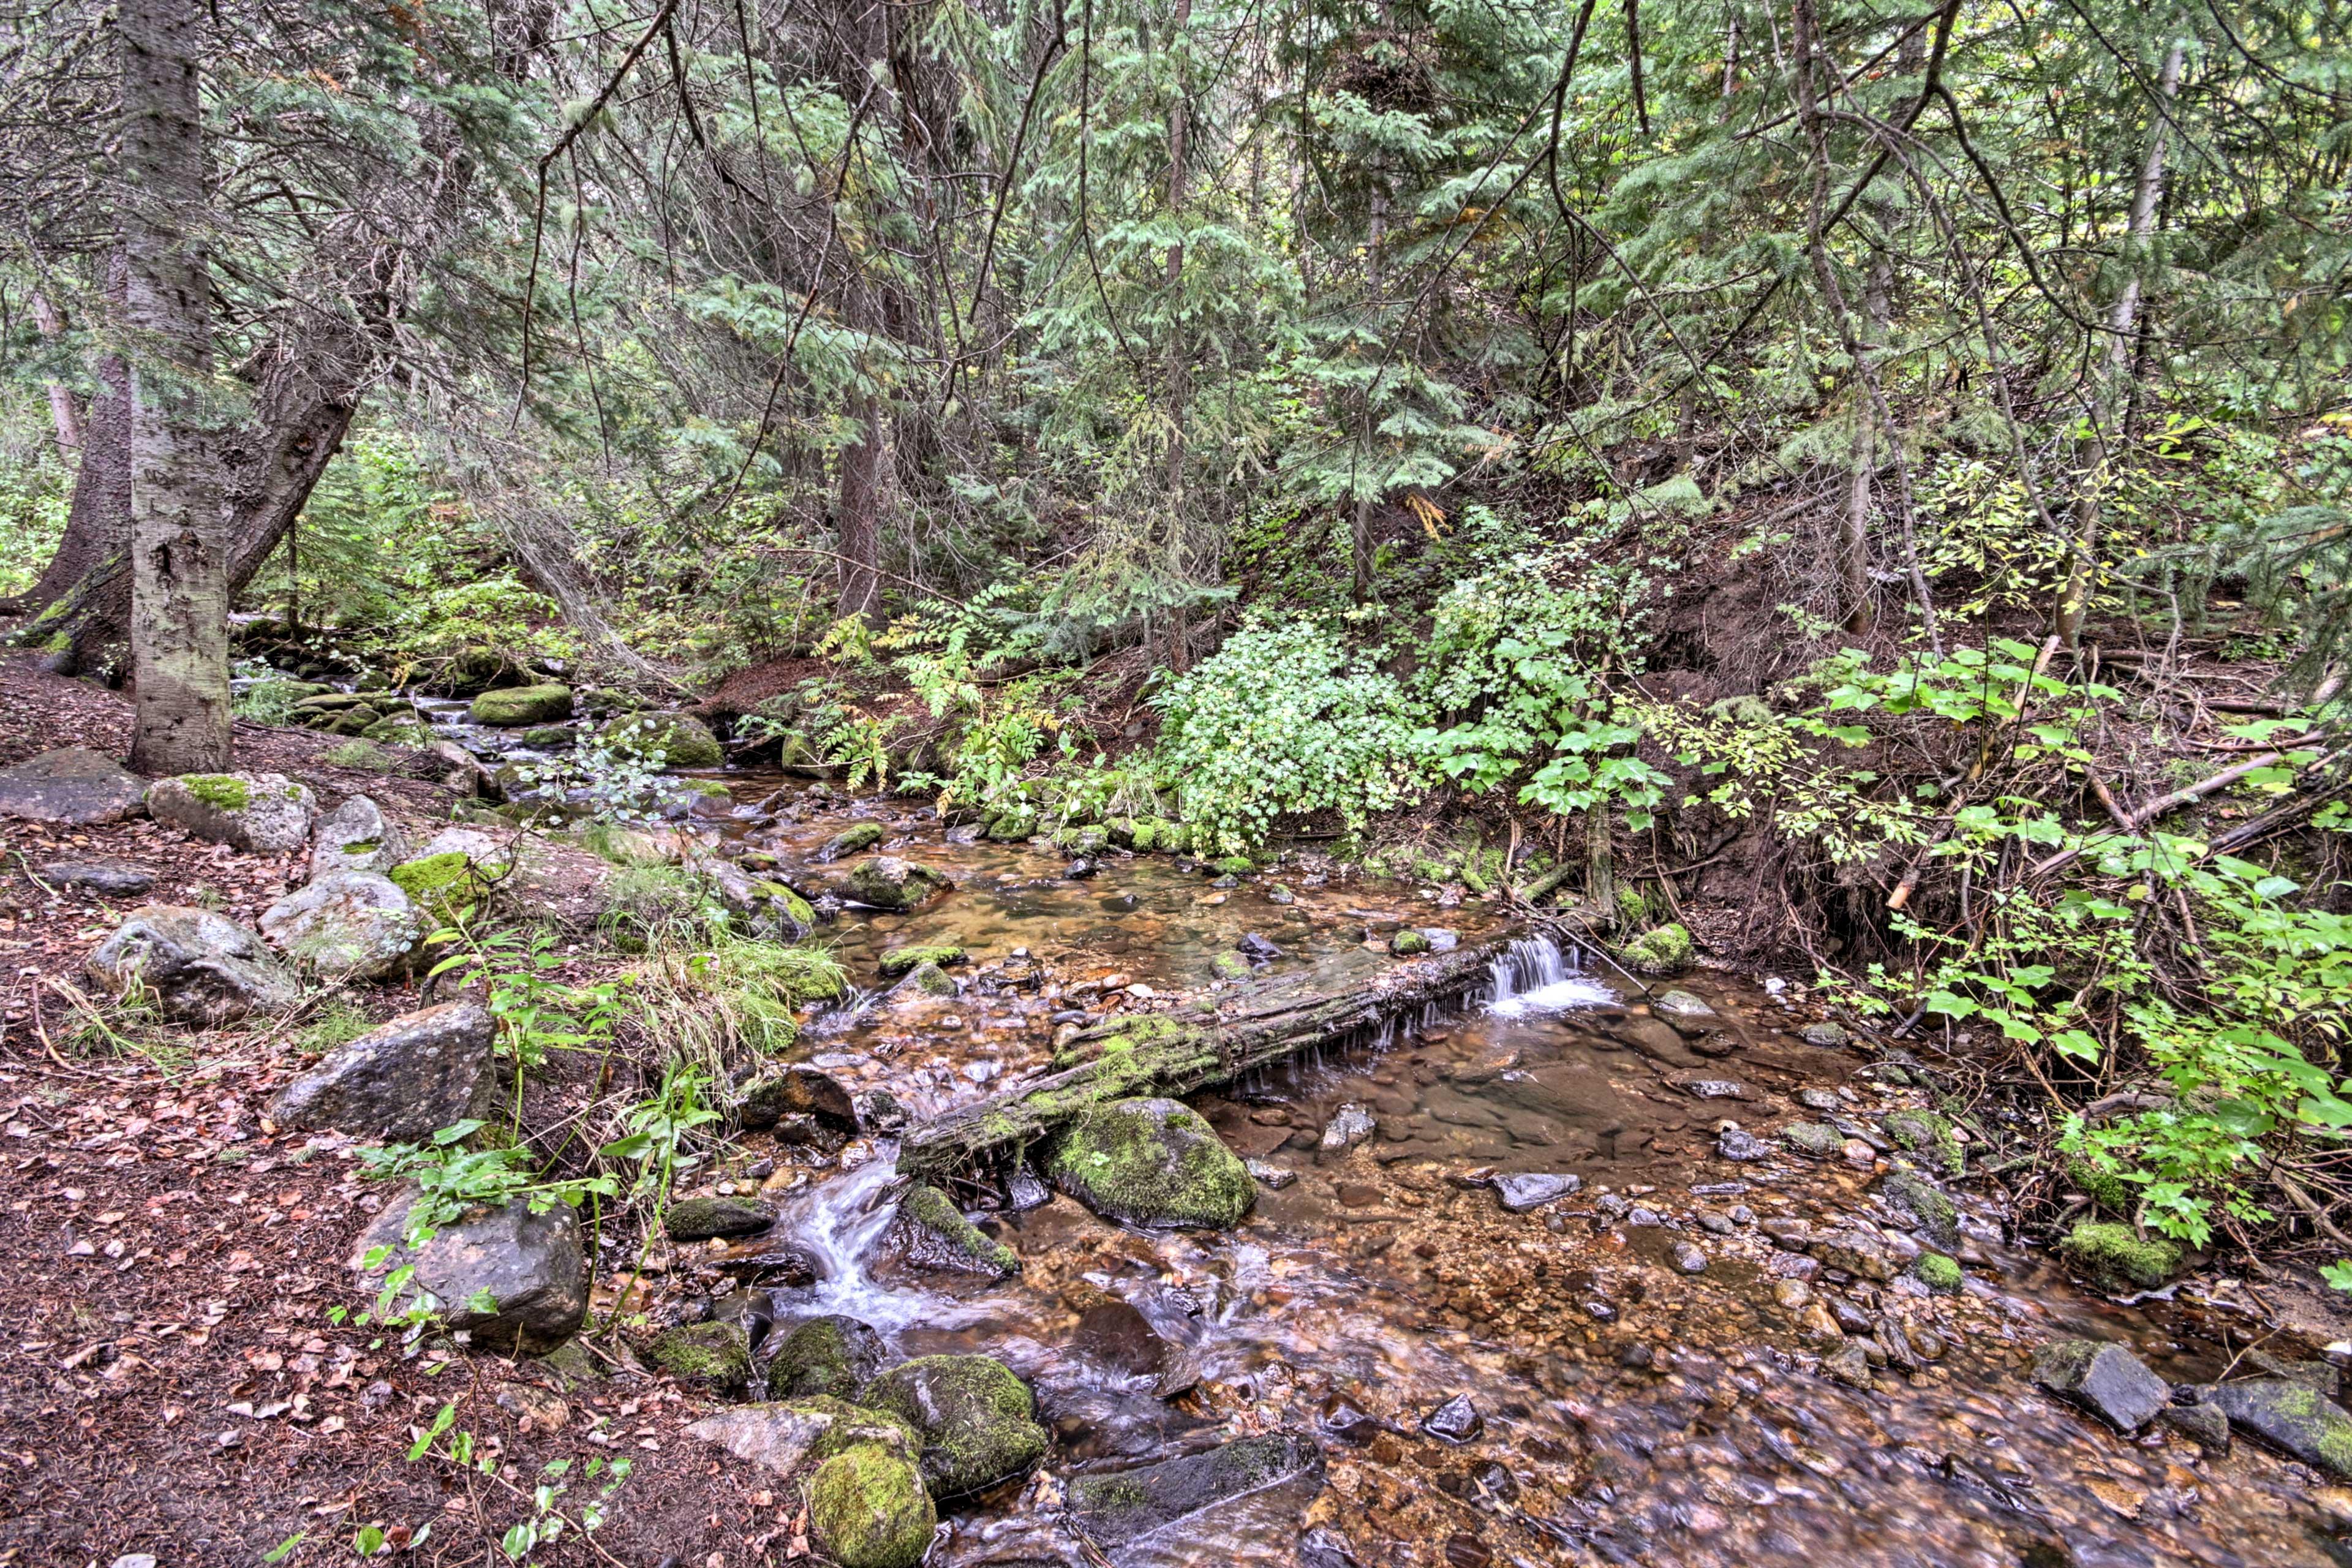 Old Town Hot Springs (4.3 Miles) | Black Sulphur Spring (5.2 Miles)